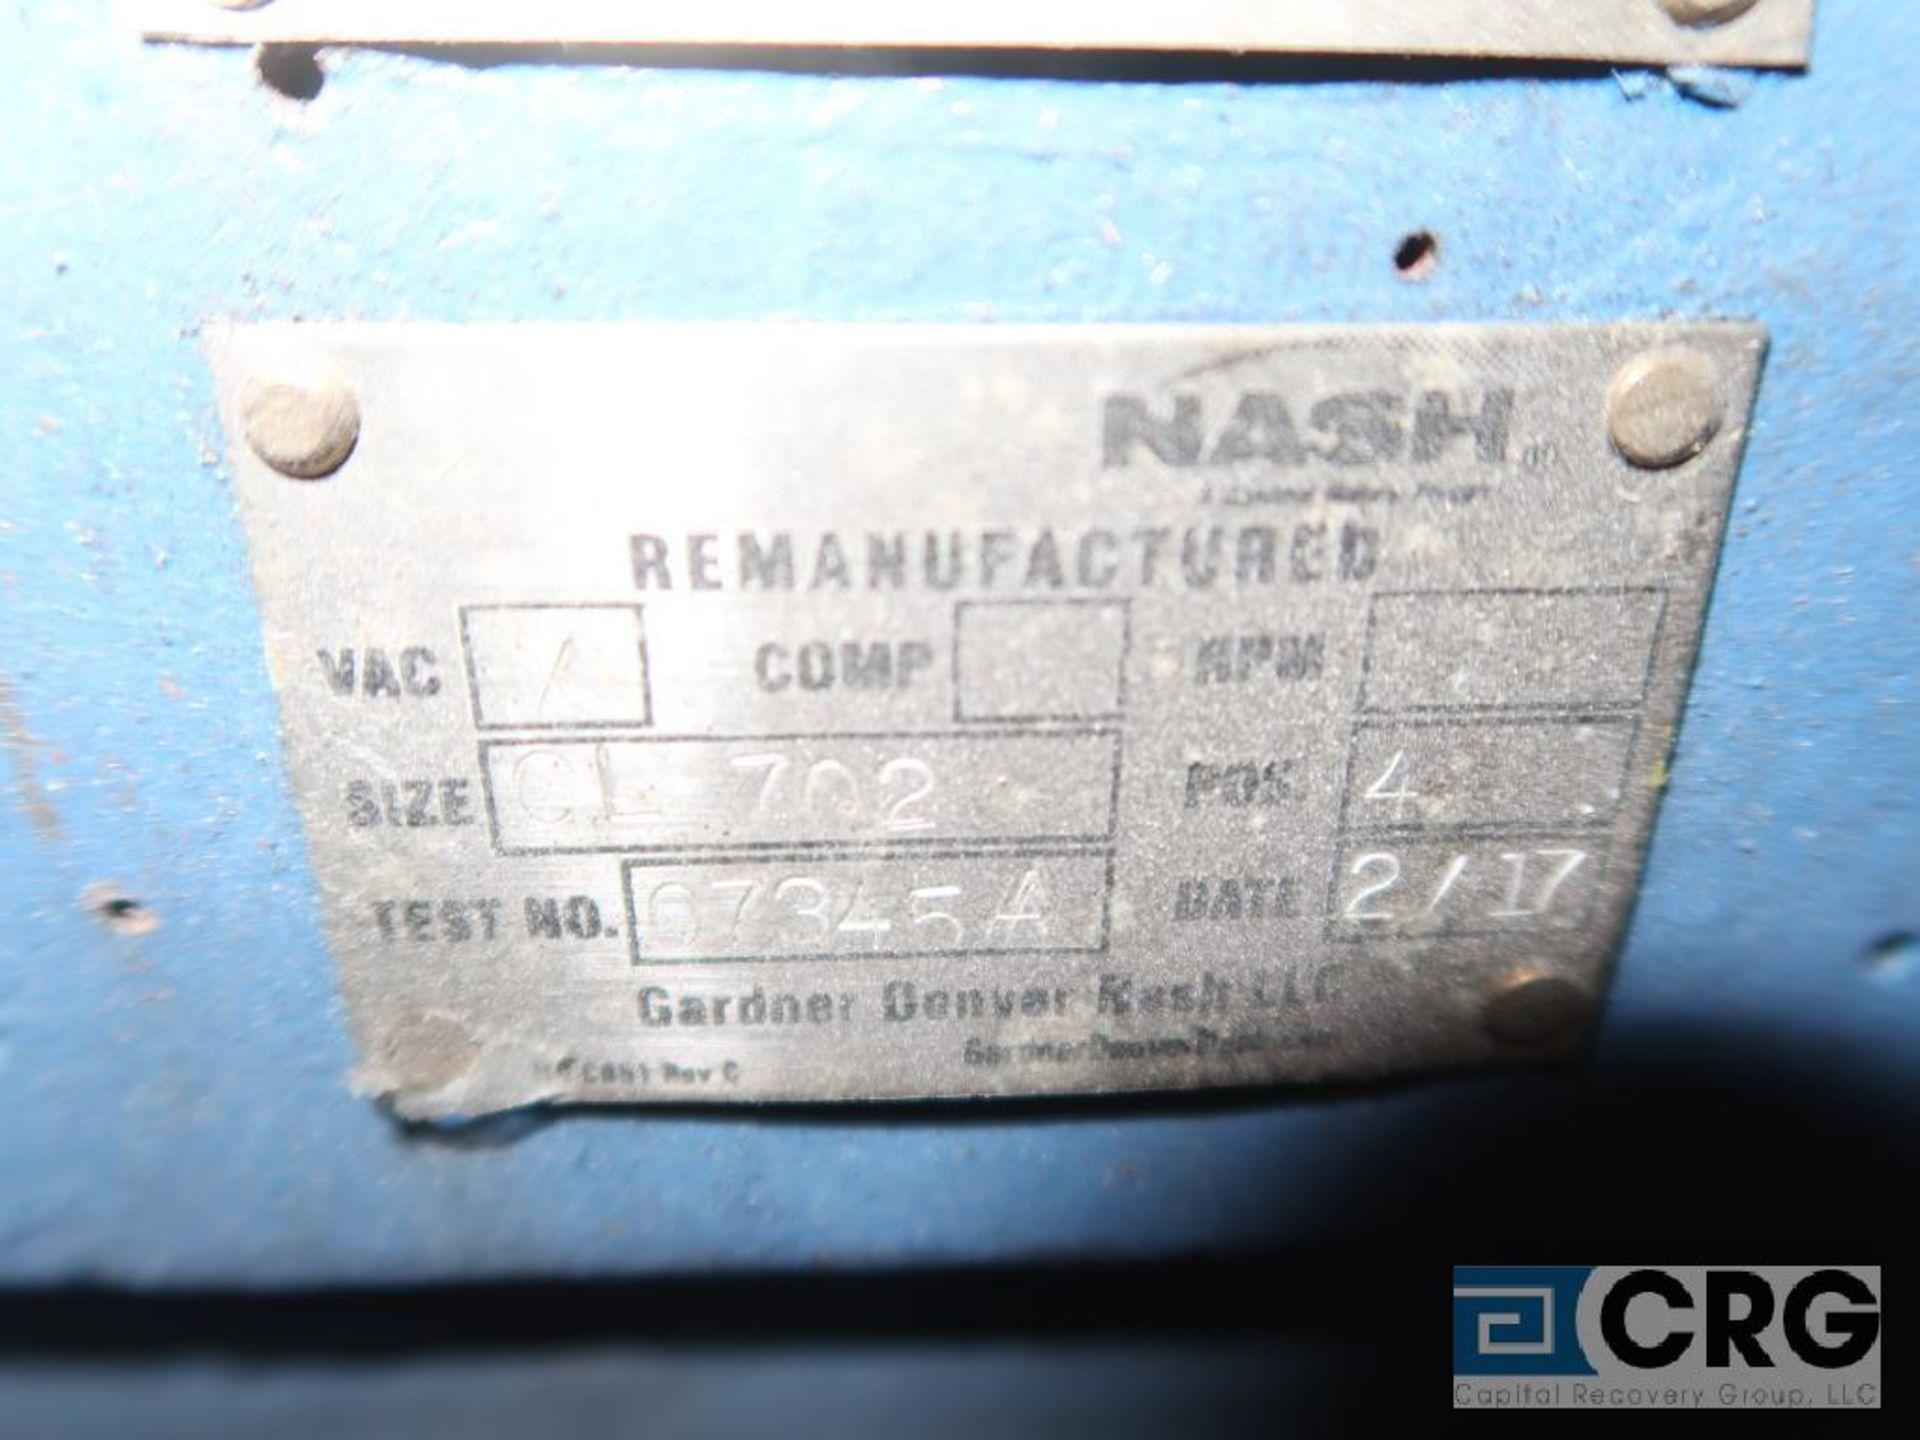 Nash CL 702 vacuum pump, mfg. 2017, s/n 7345 (Off Site Warehouse) - Image 2 of 2